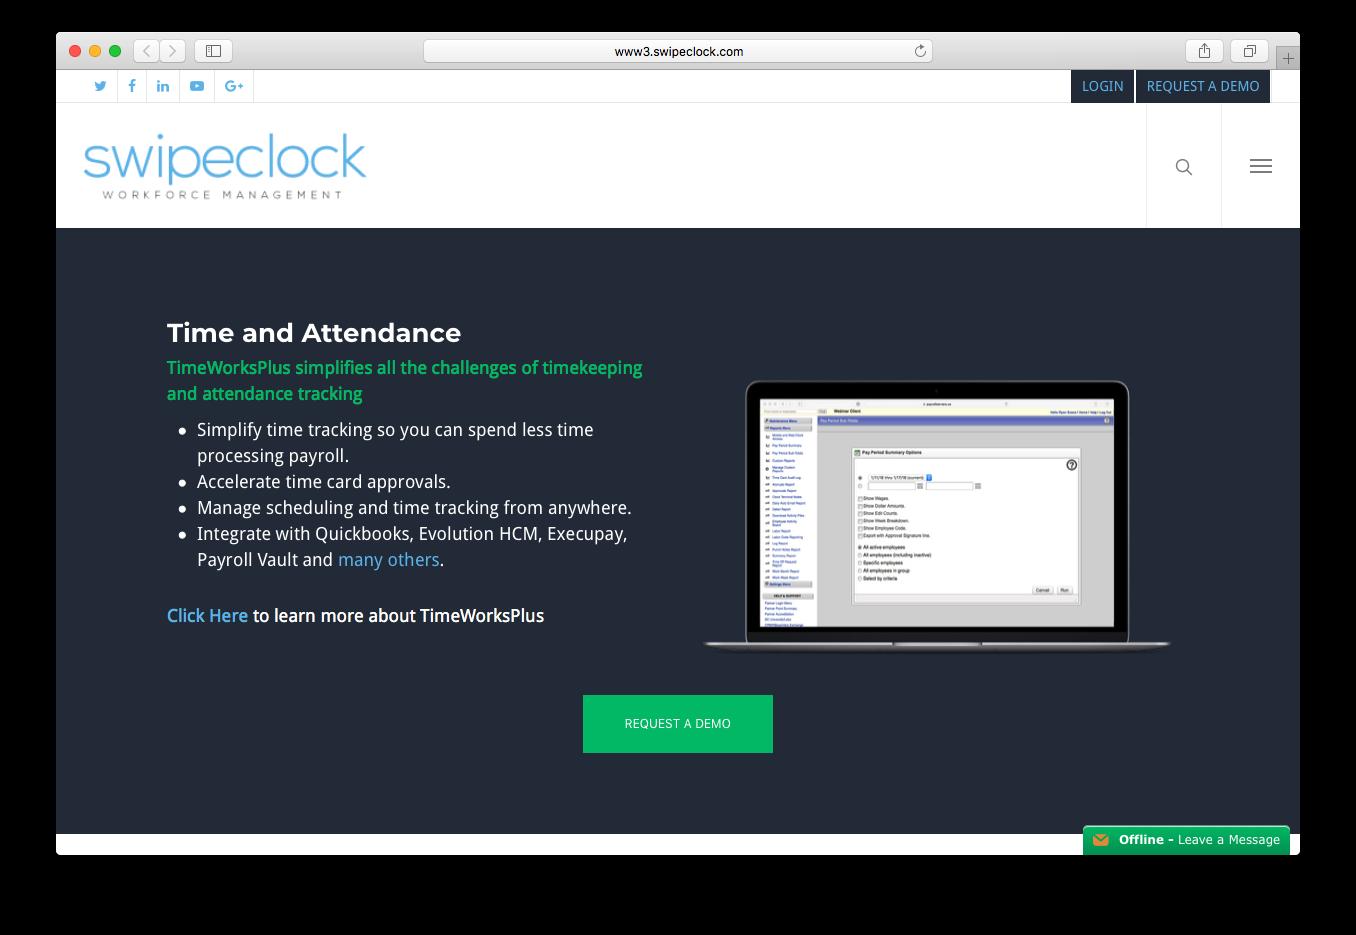 Swipeclock workforce management suite timeworksplus time keeping attendance tracking